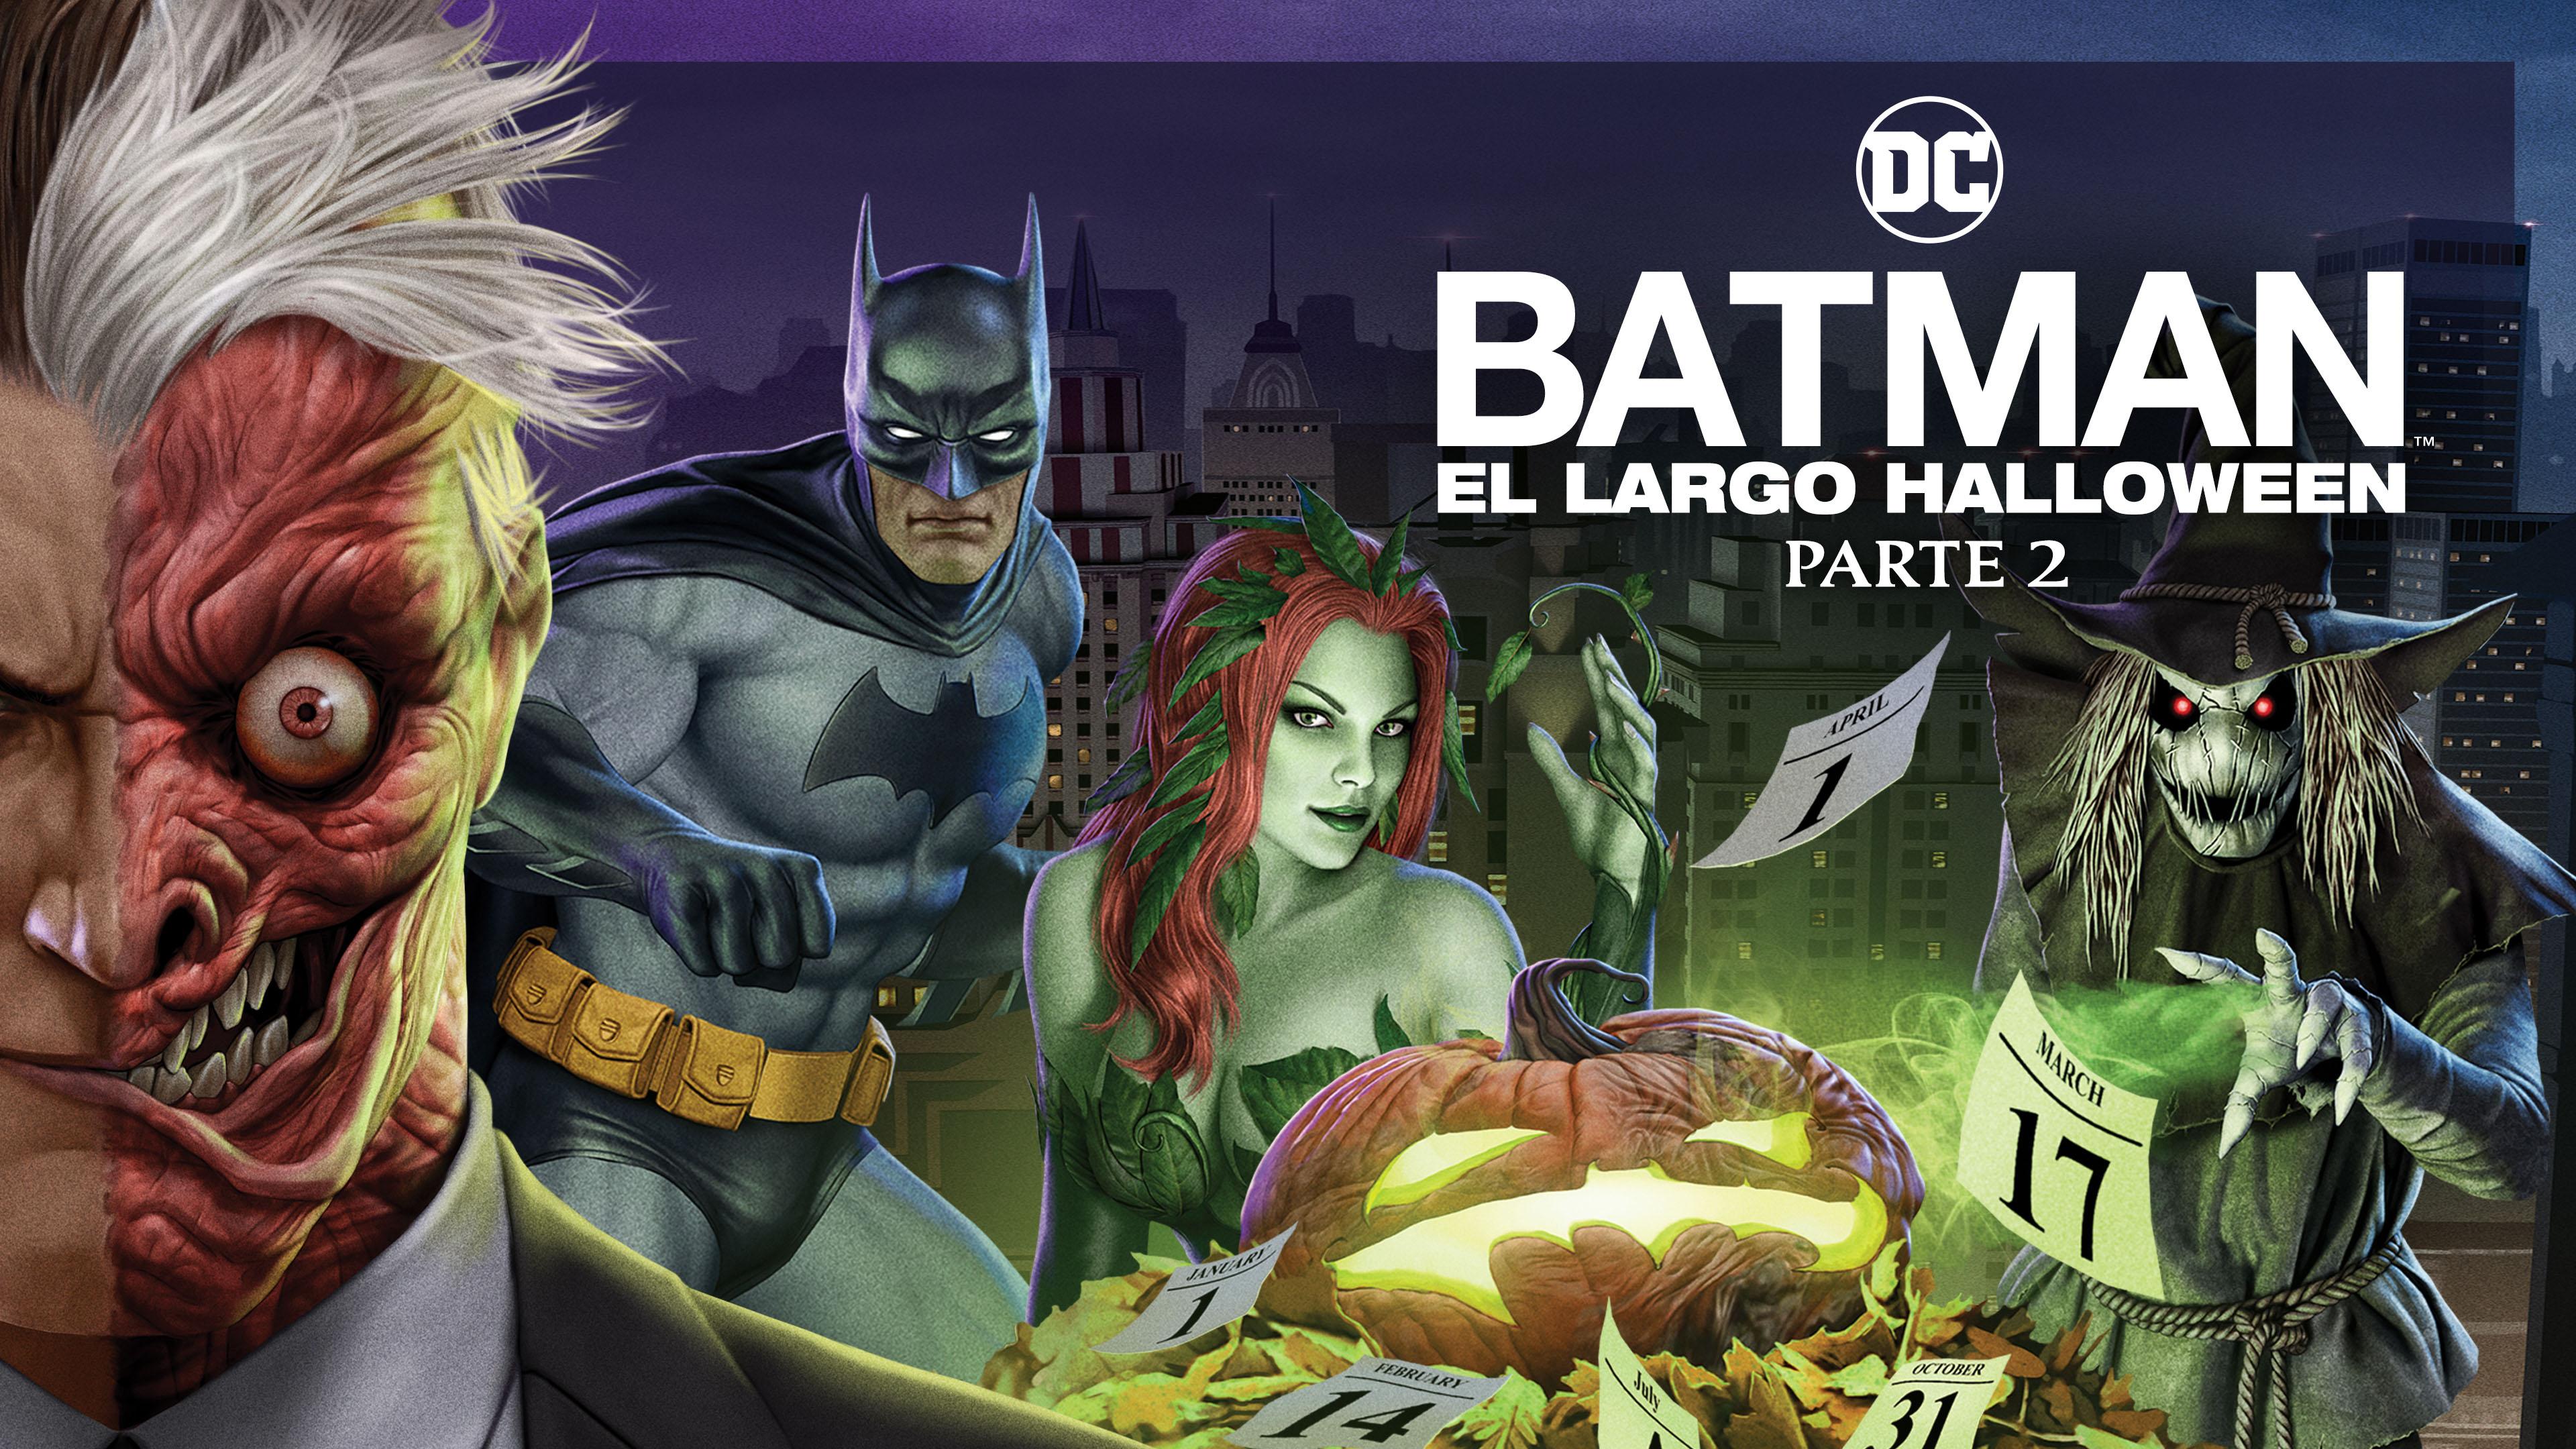 batman, largo halloween, DC, animated, WB, peliculas animadas